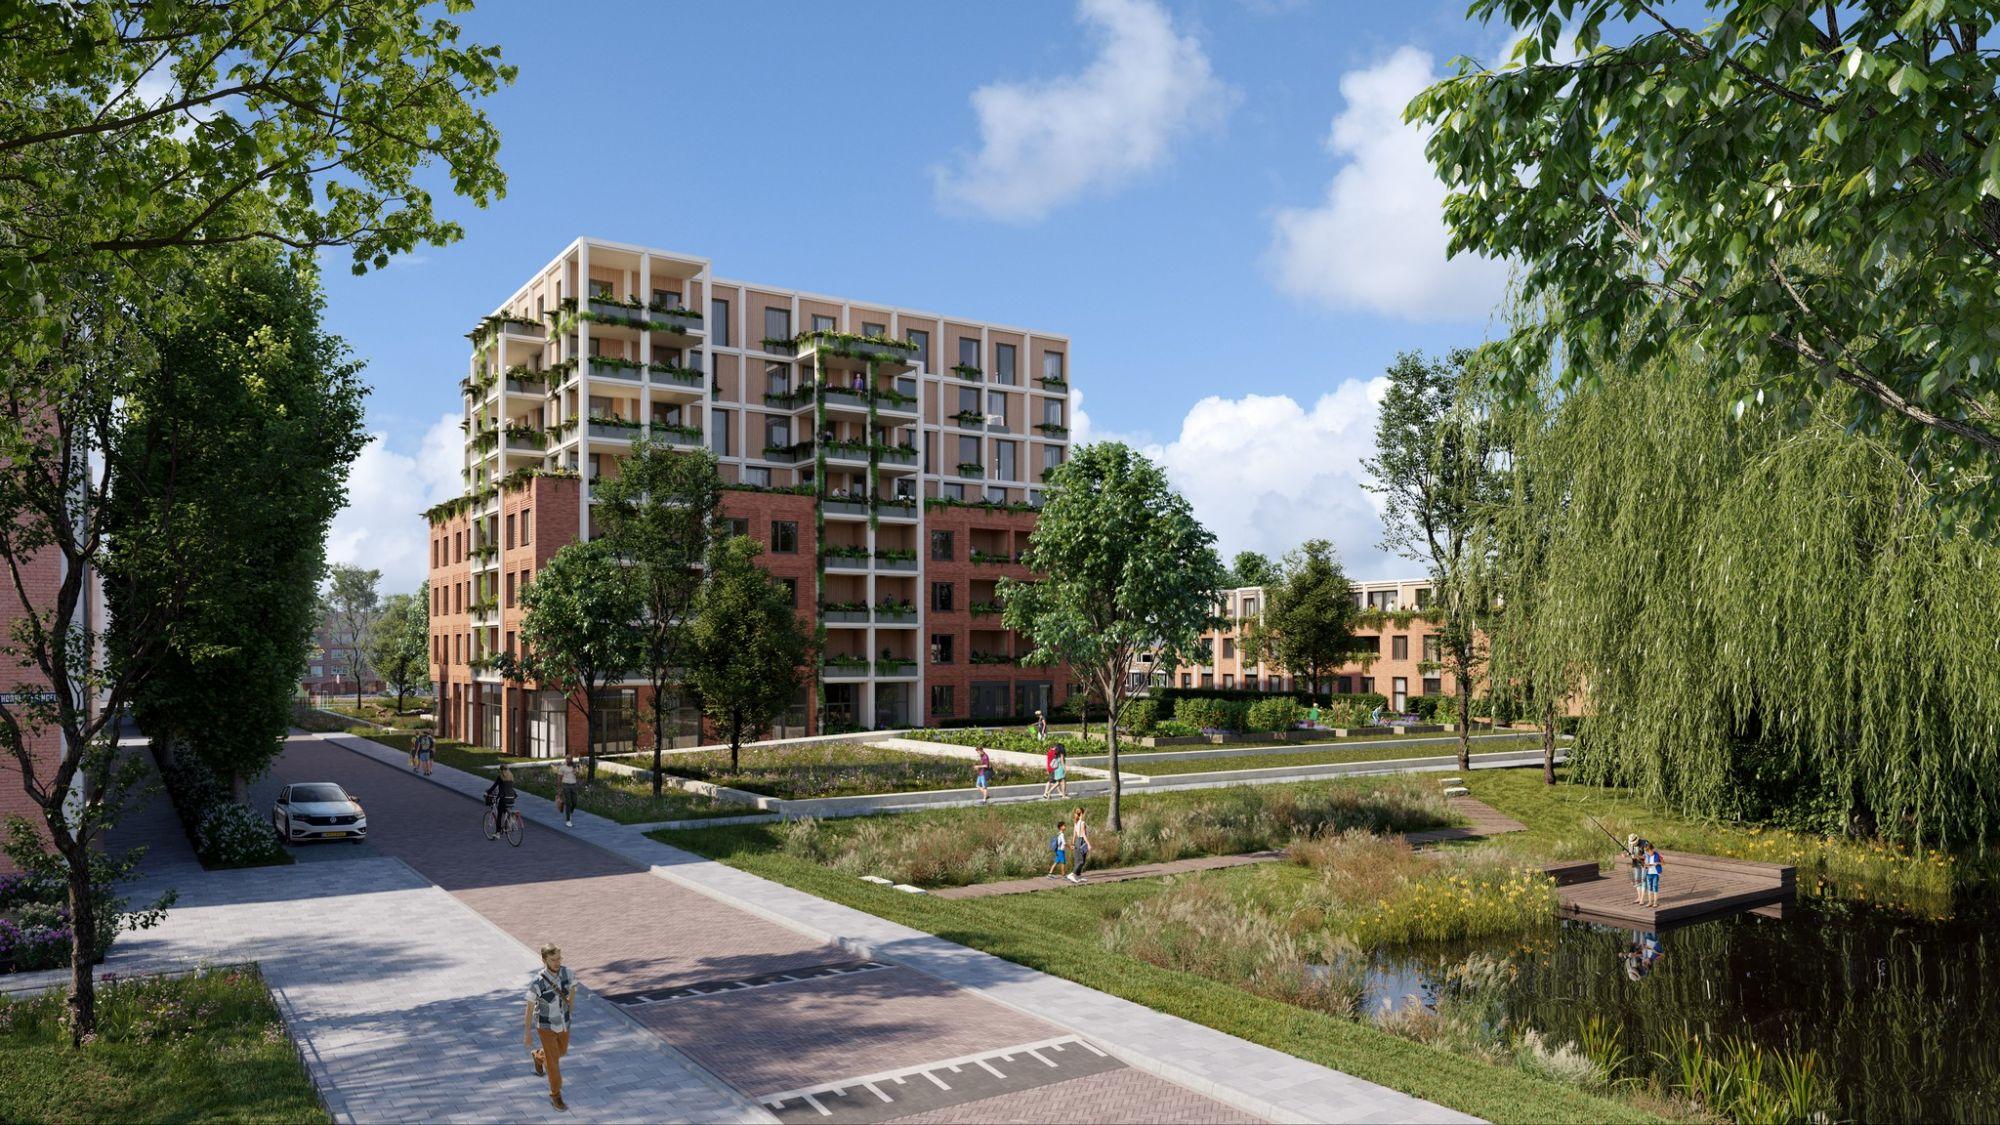 Honderddertig nieuwe woningen op groen Wibautplein